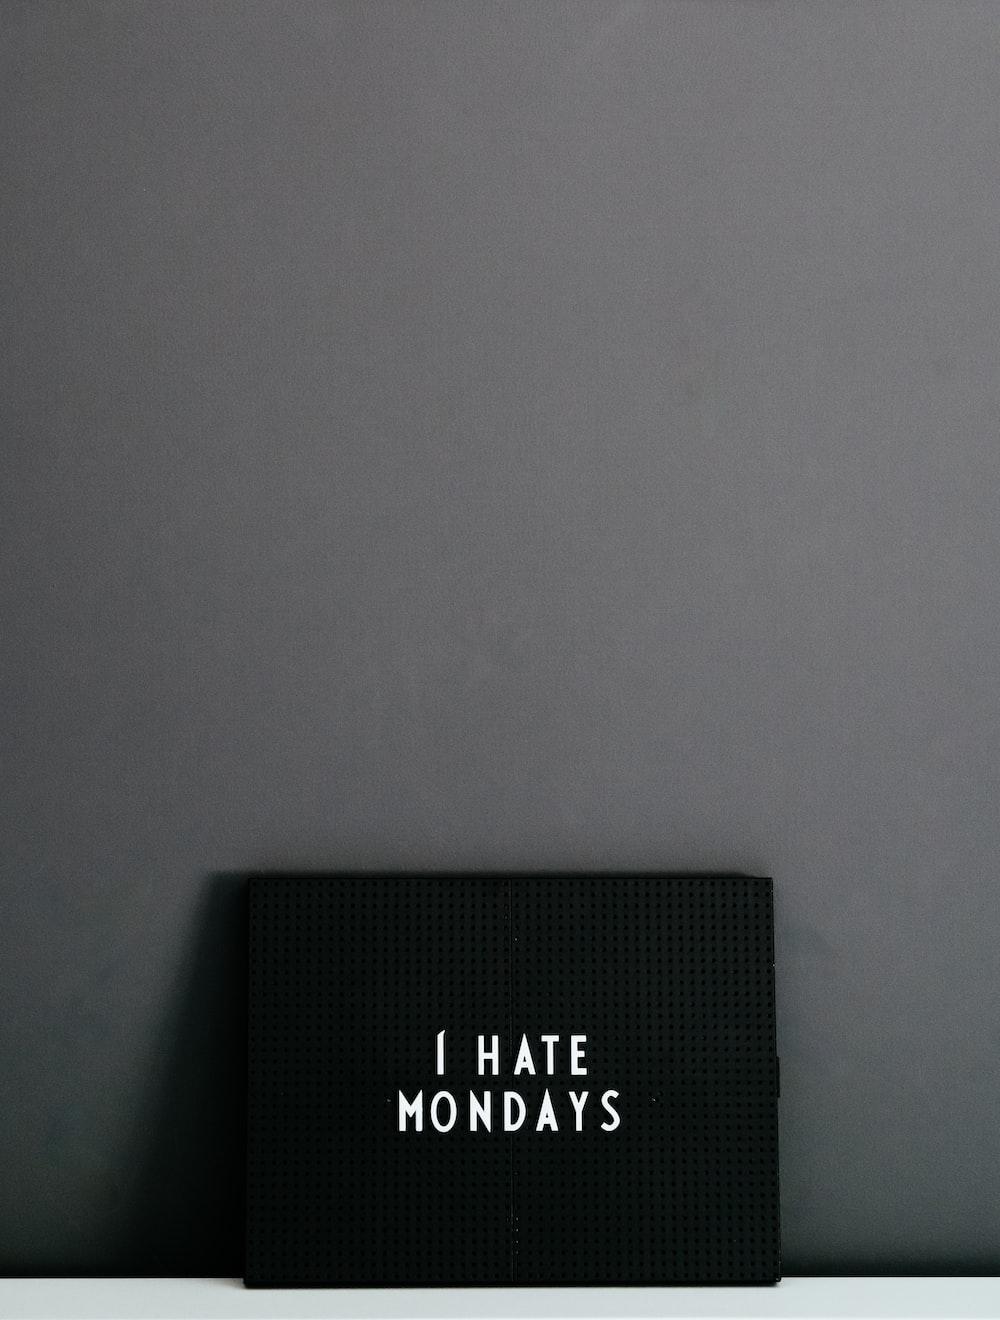 black box on white surface